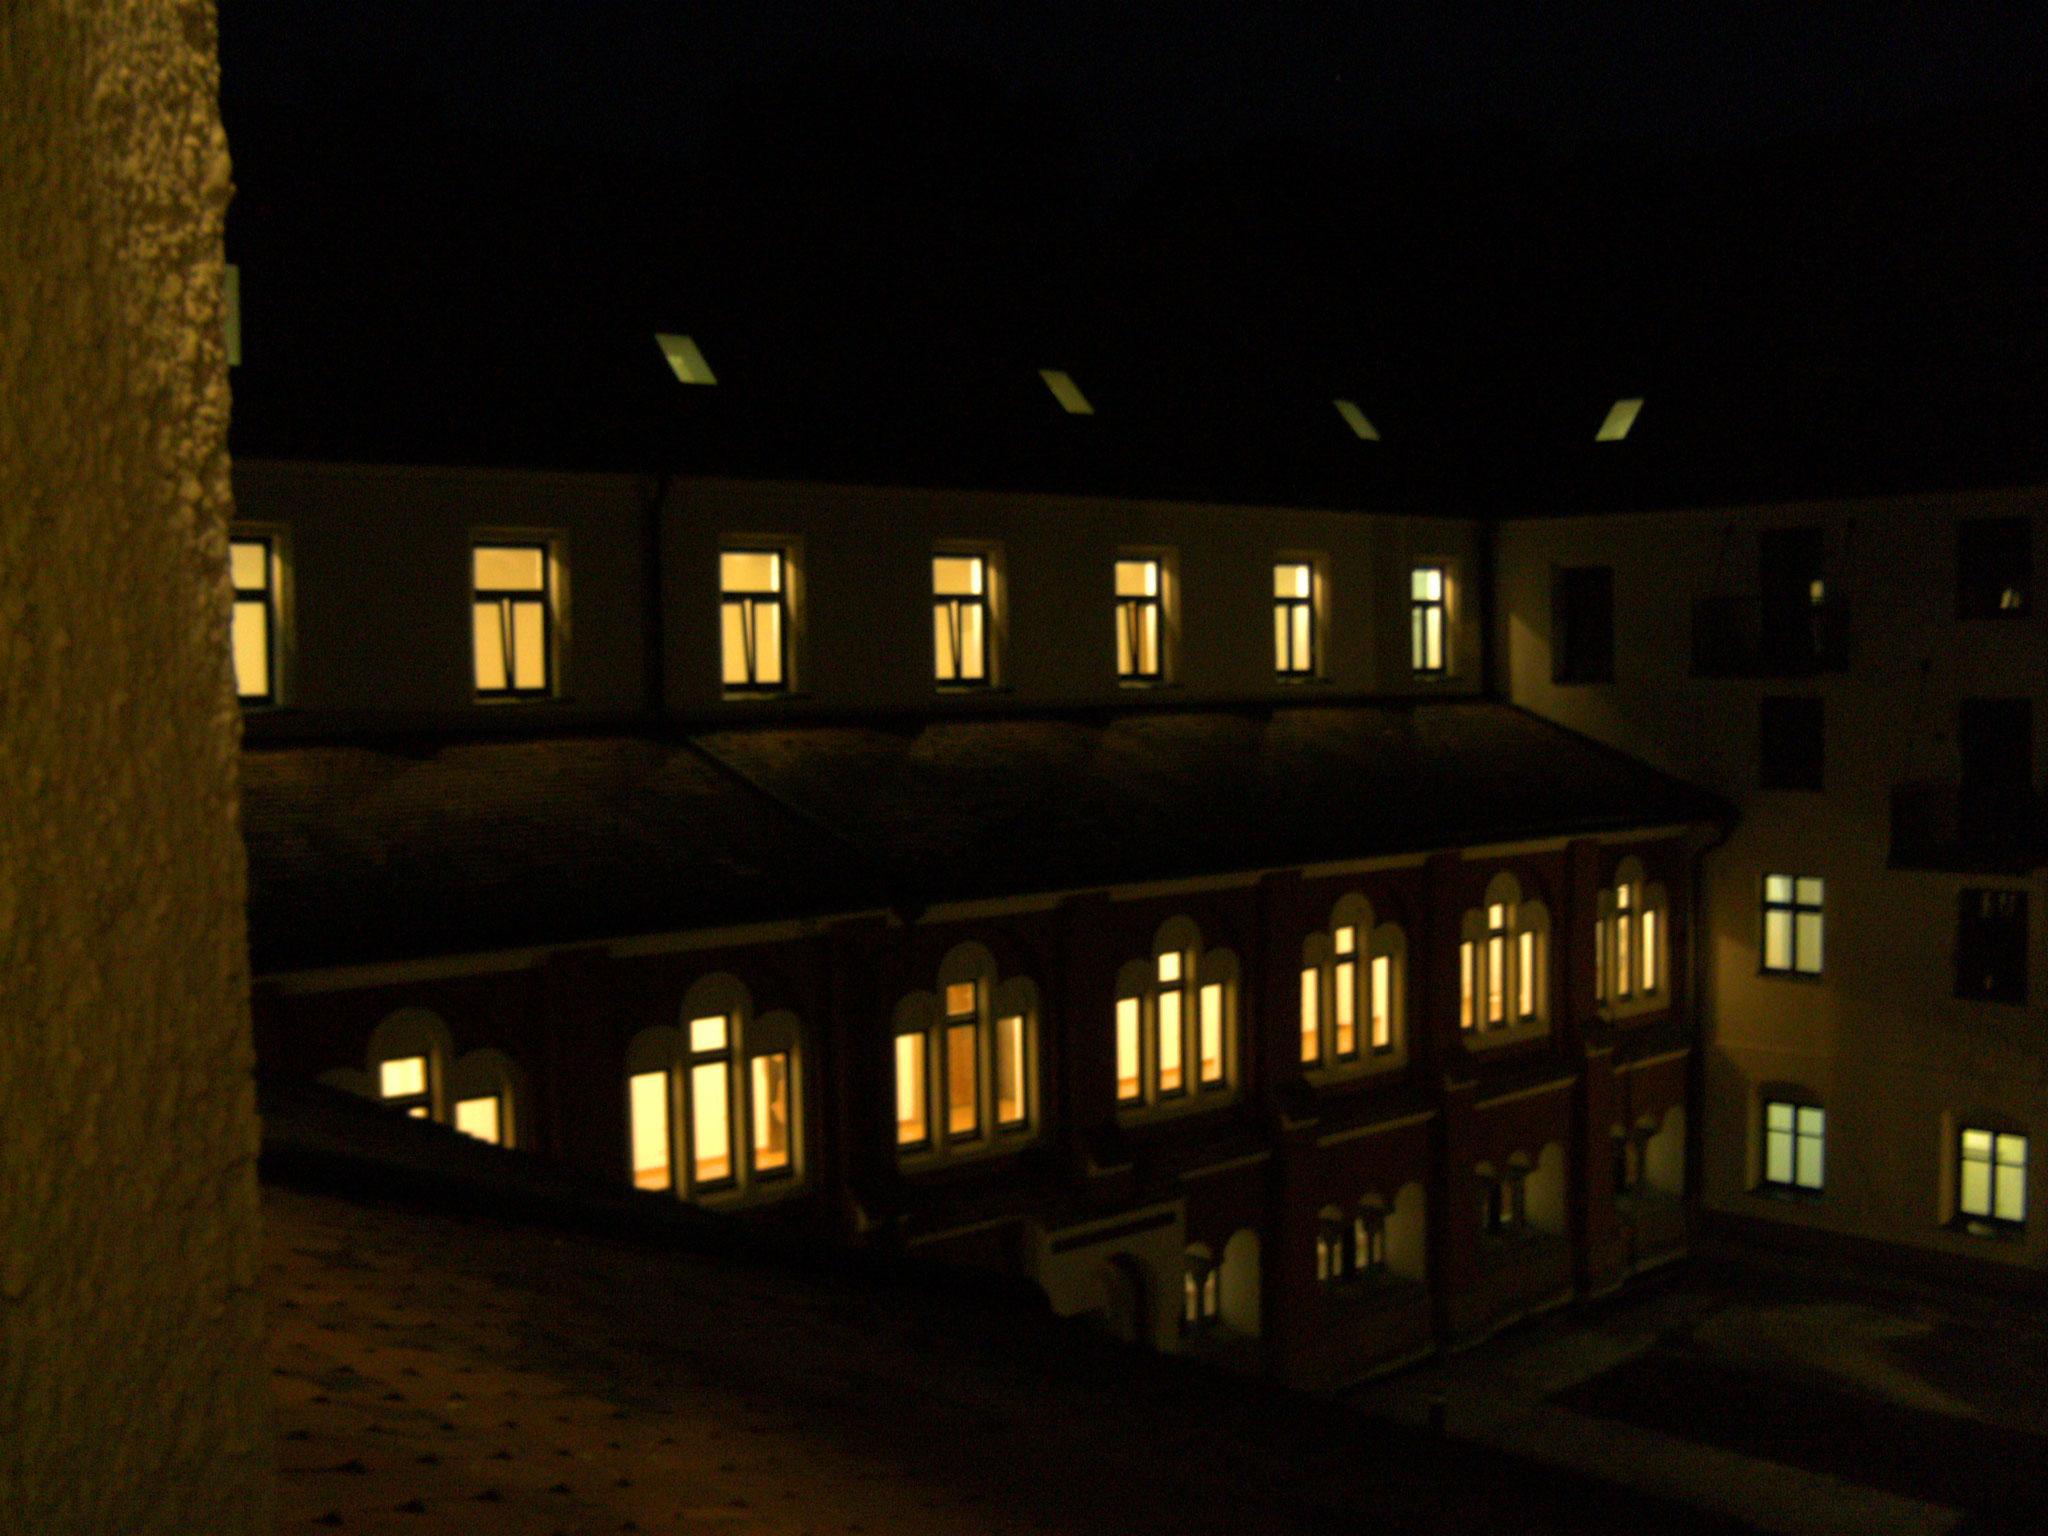 Nacht-Impression Innenhof-Fassade